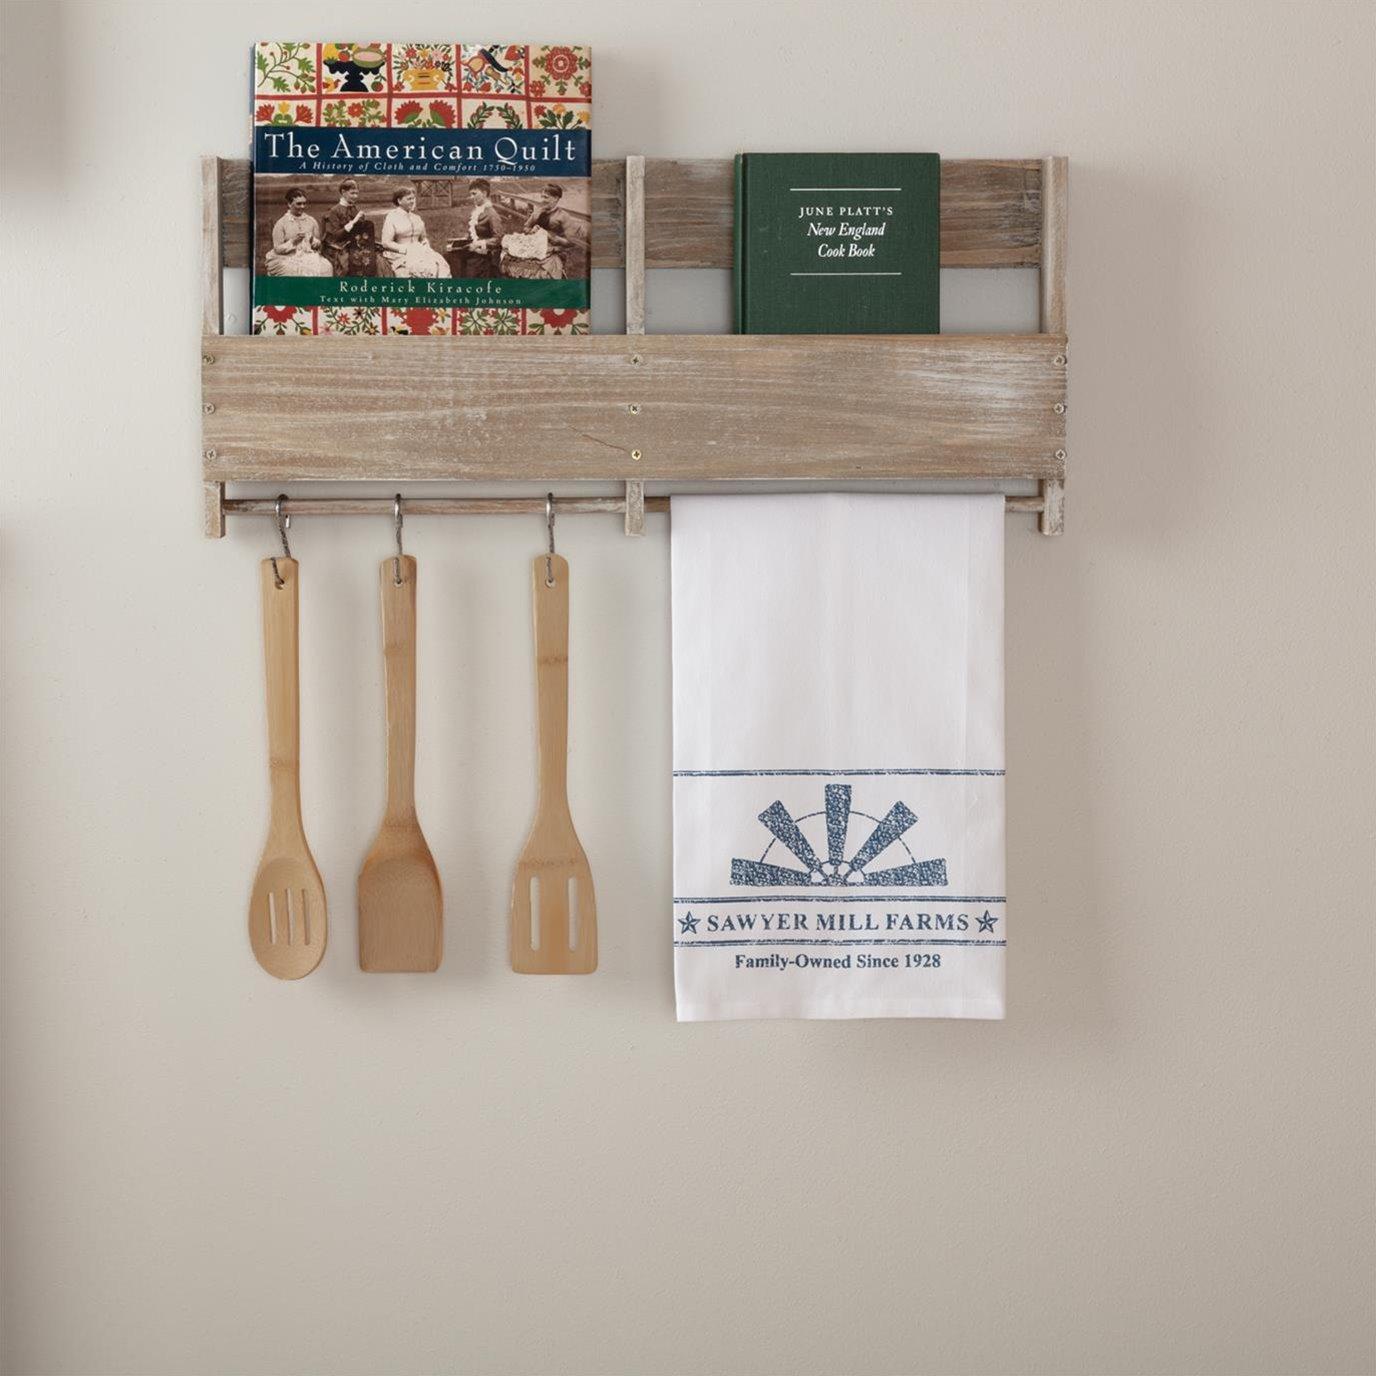 Sawyer Mill Blue Windmill Blade Muslin Bleached White Tea Towel 19x28